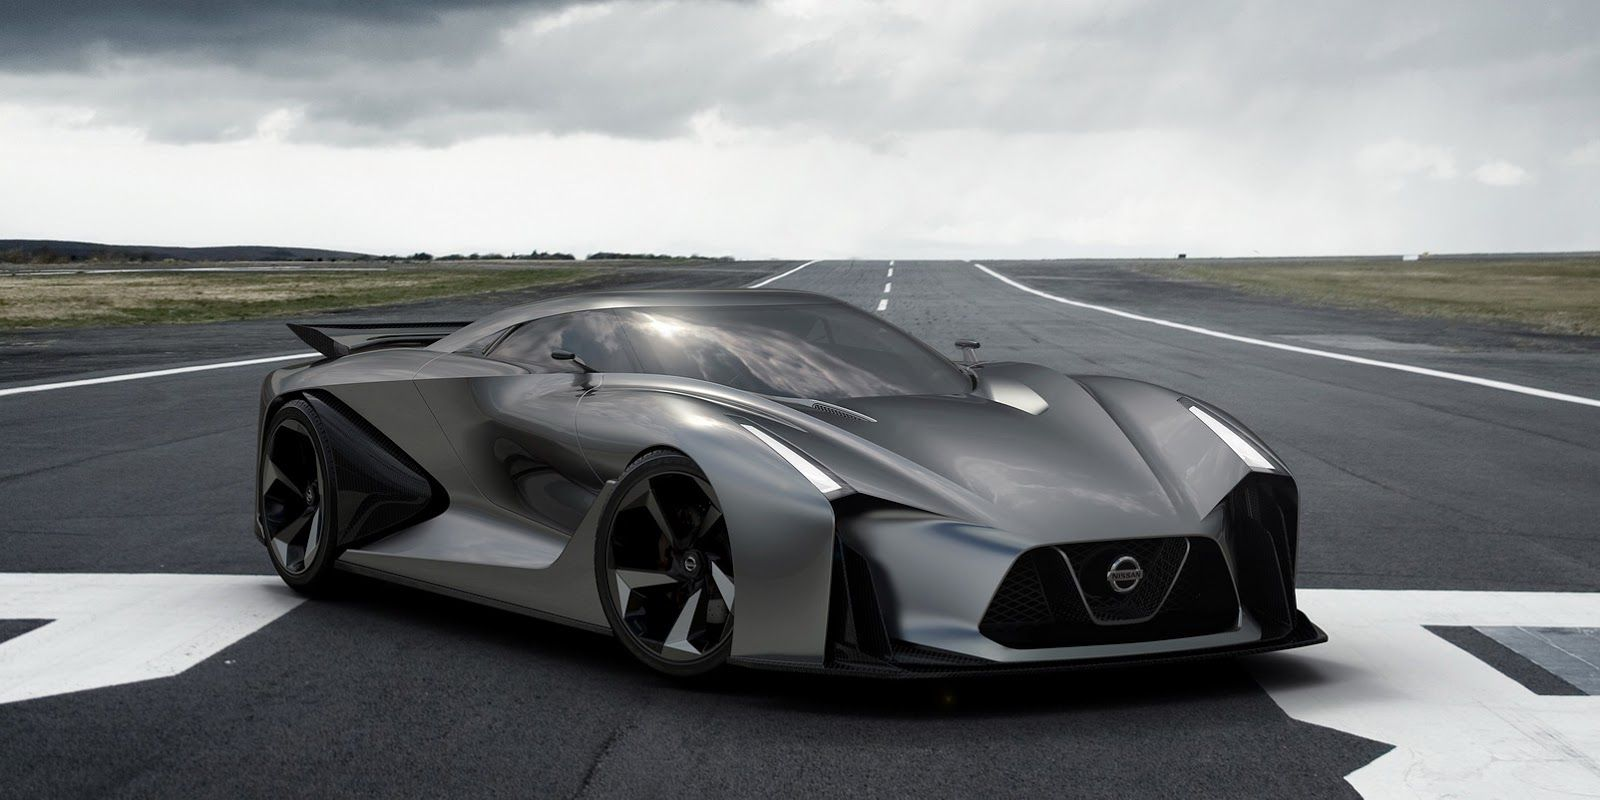 2017 Nissan GT-R R36 Hybrid Concept - http://world wide web ...